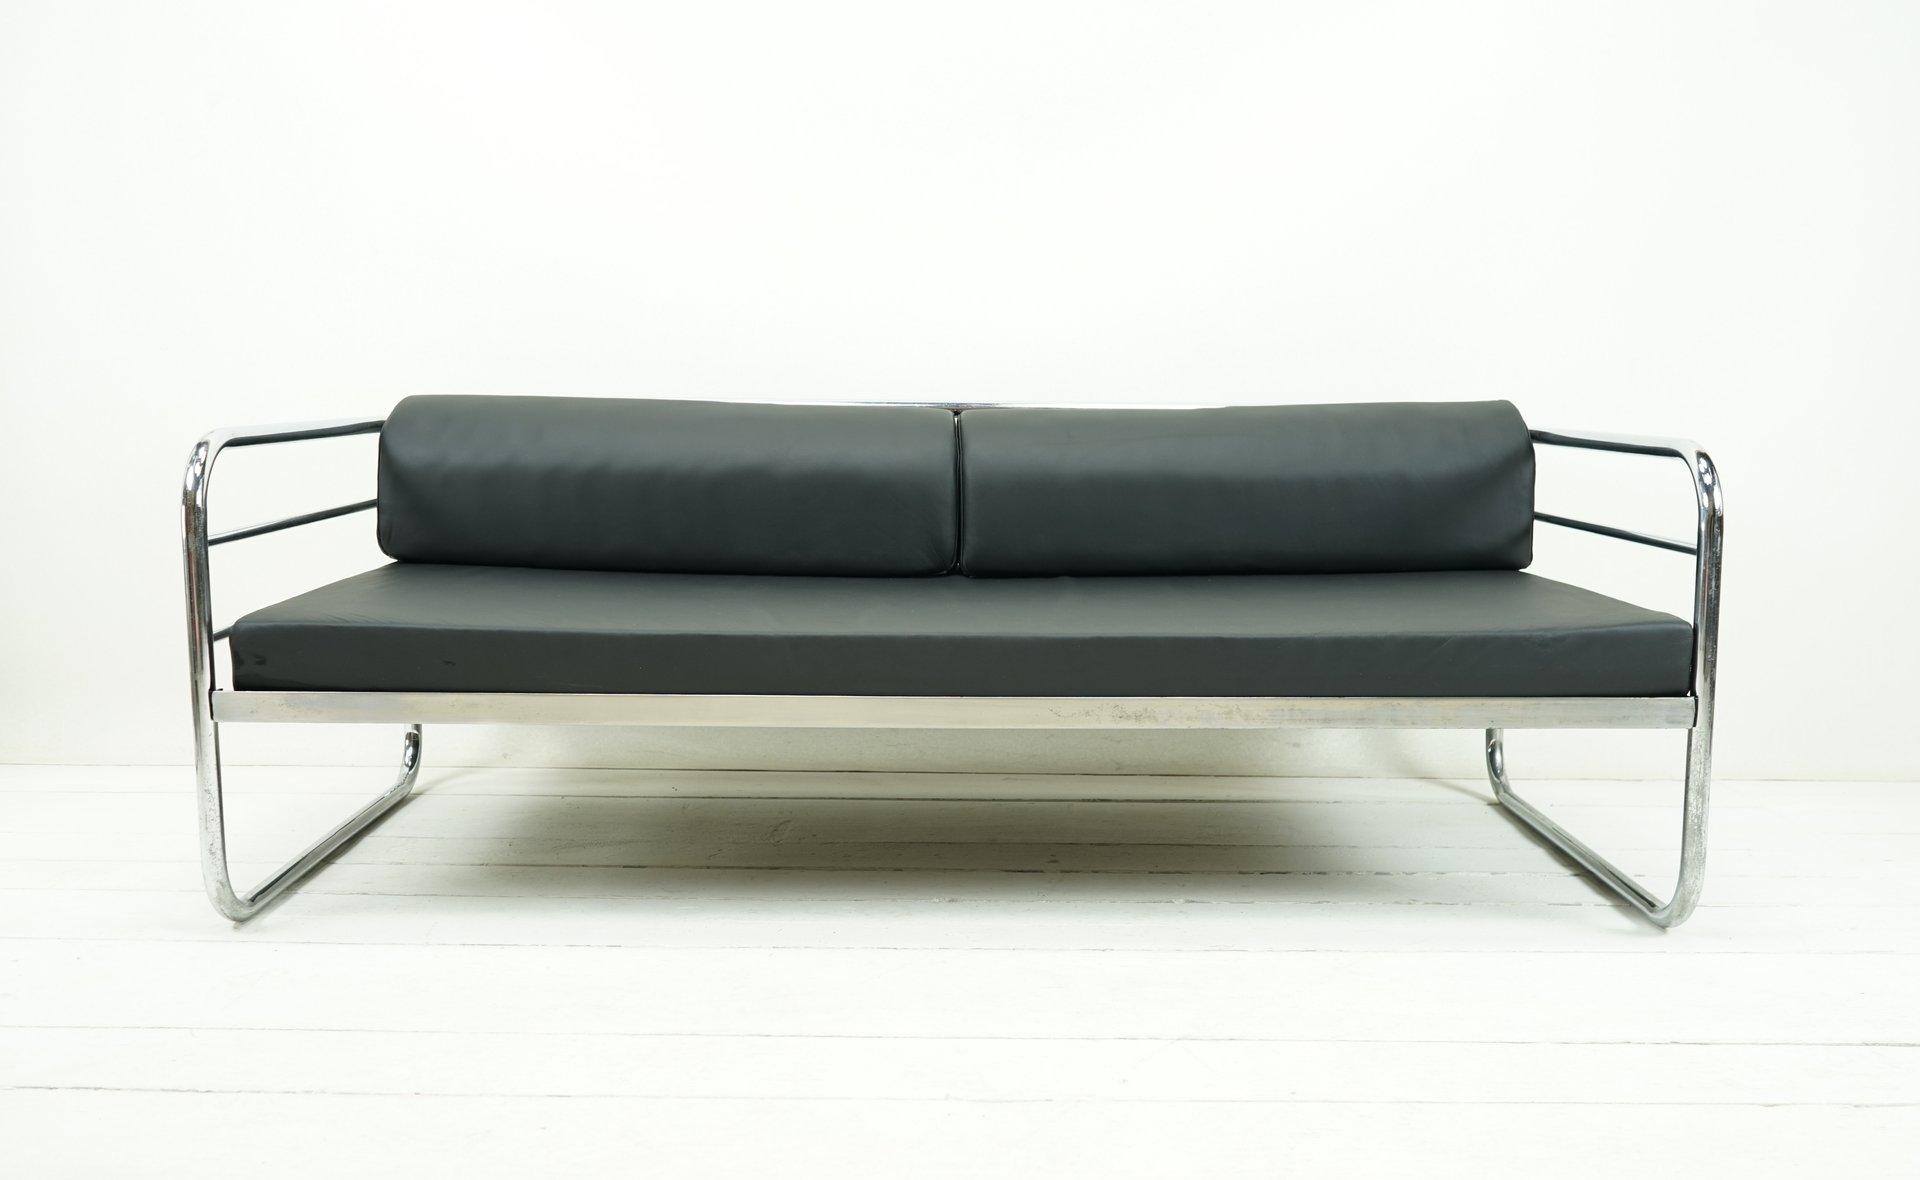 Beautiful Vintage Bauhaus Daybed Sofa From Muecke Melder